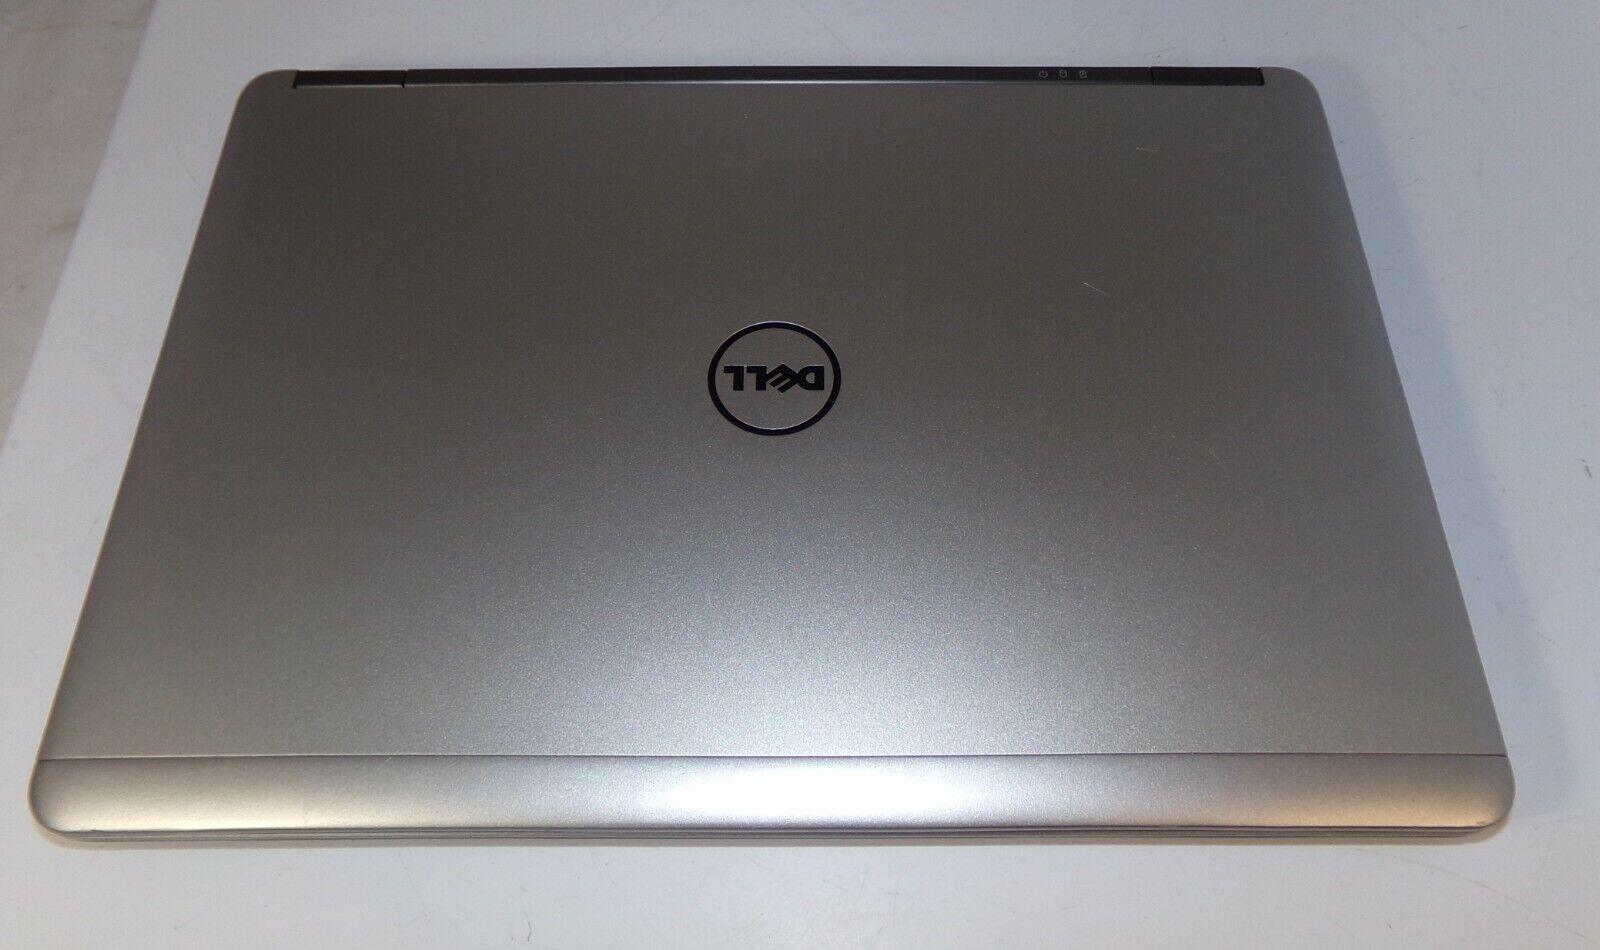 "Laptop Windows -  Dell Latitude E7440 14"" i5-4300u 1.9 GHz 8GB RAM 128GB SSD Windows 10 Home"